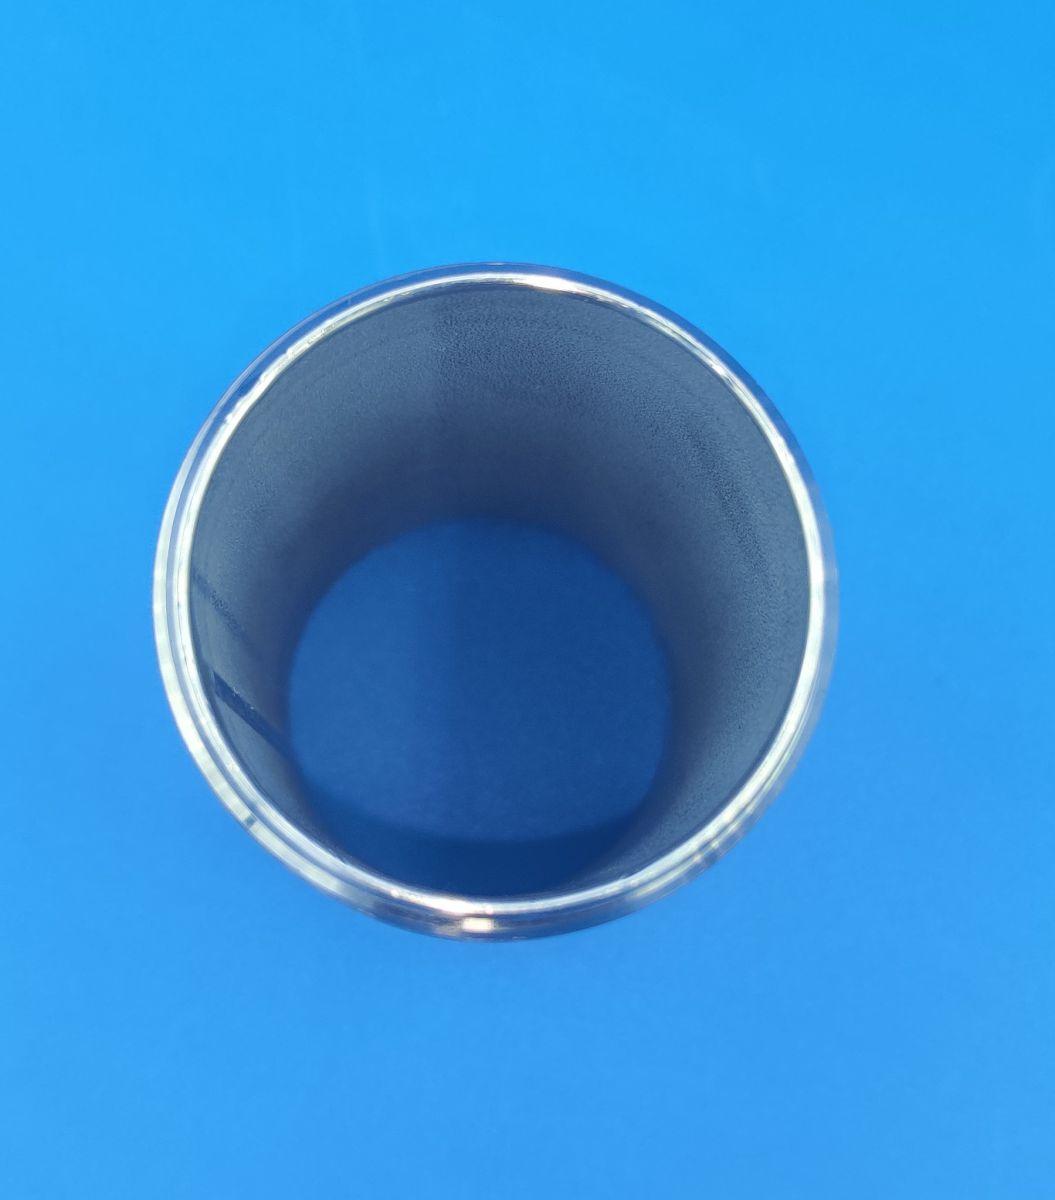 112 bspt equal barrel nipple stainless steel